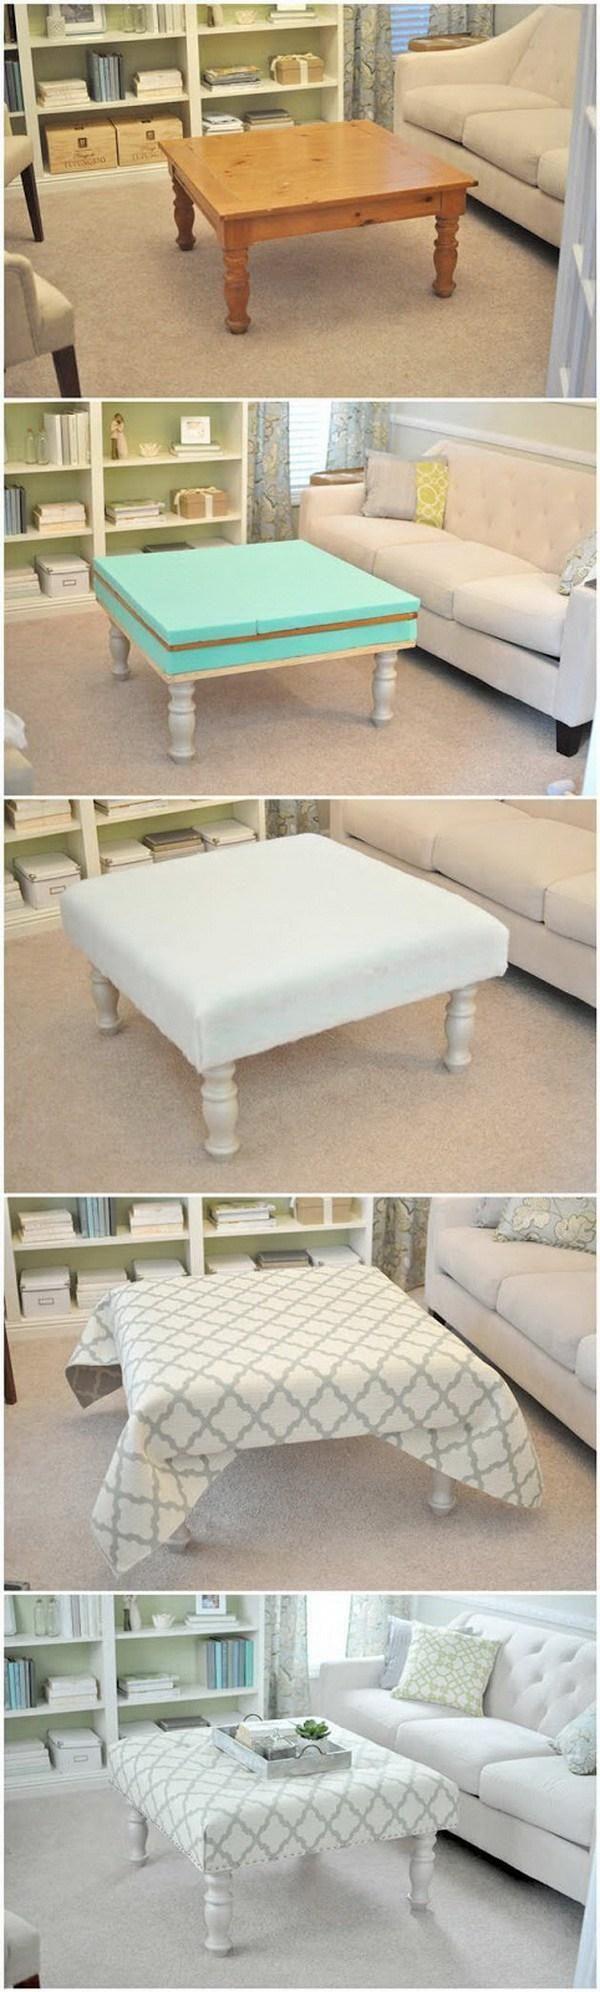 20 DIY Ideas to Reuse Old Furniture News Break Organizing